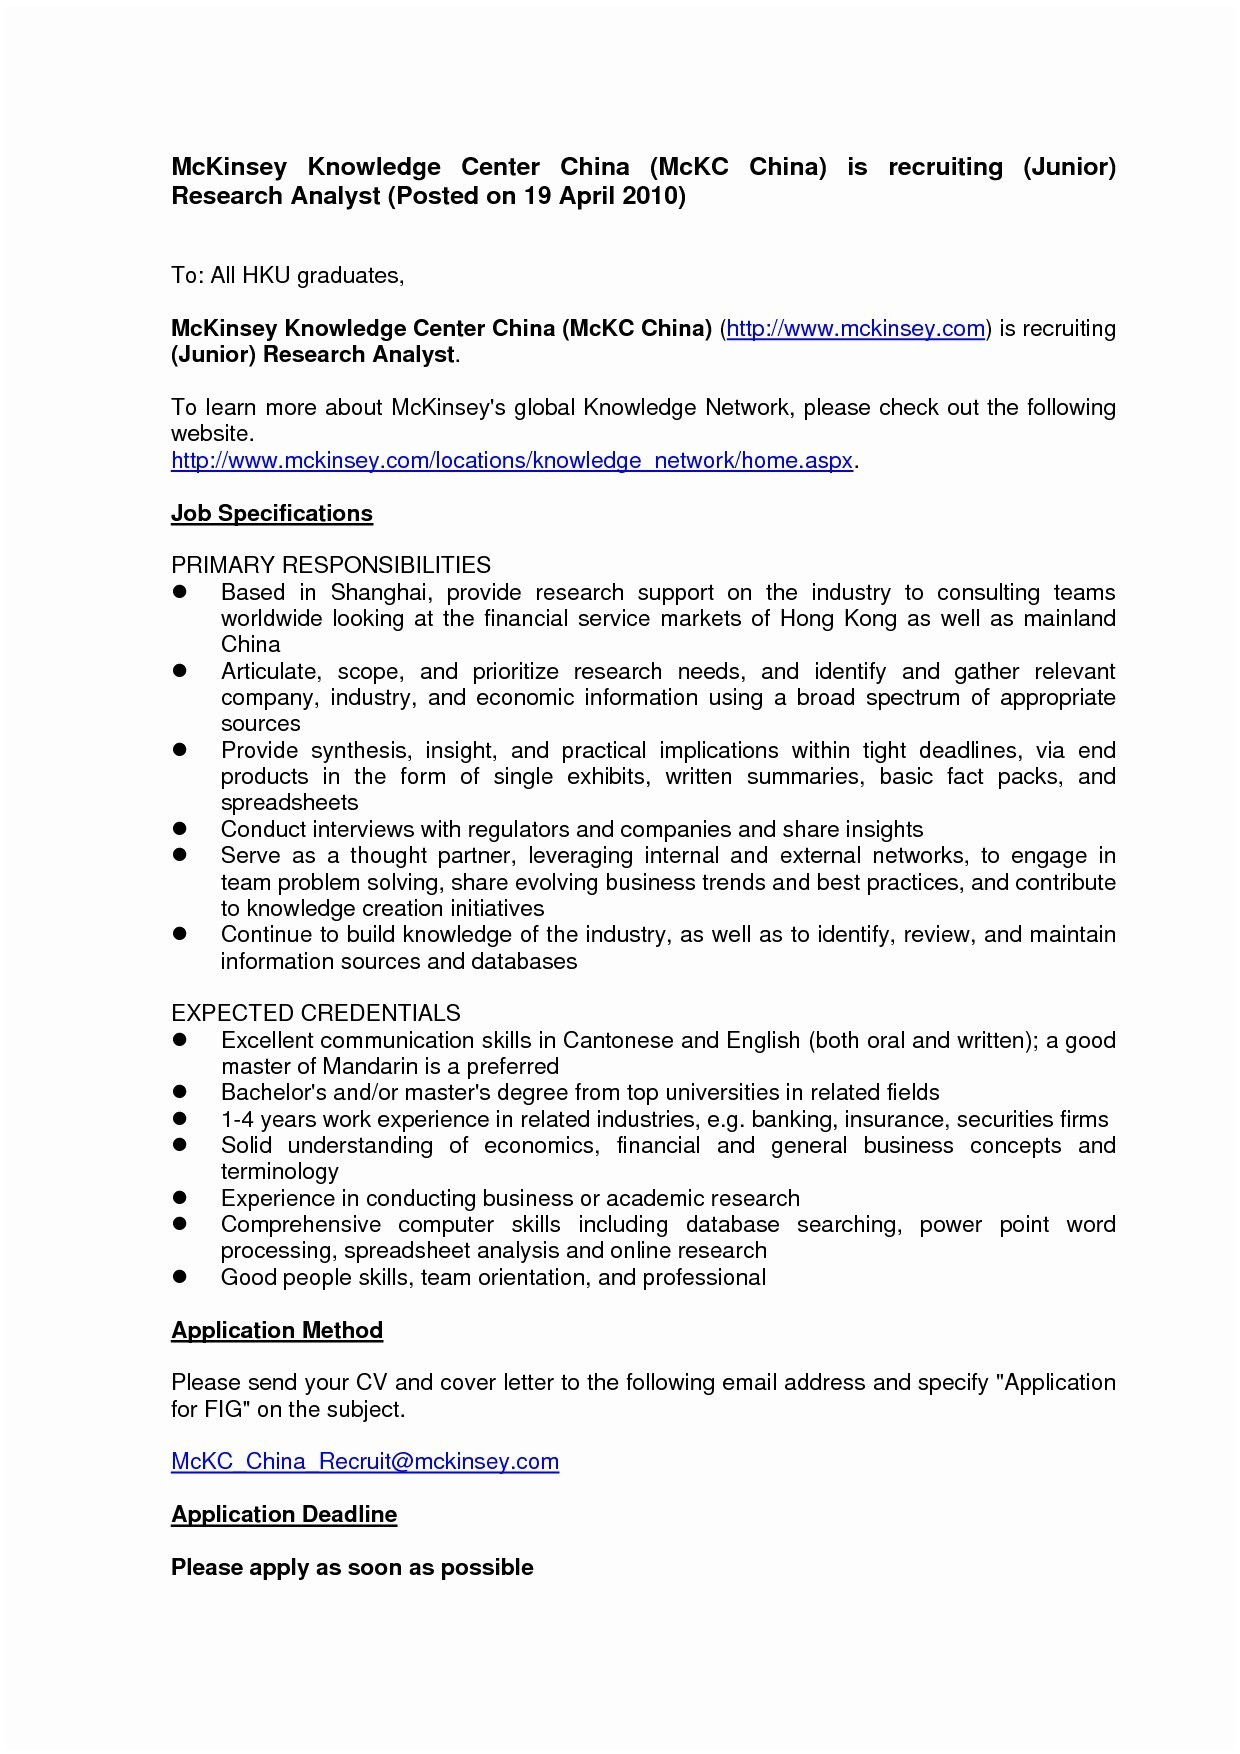 Sales associate Cover Letter Template - Cover Letter for Sales assistant Job Best New Job Fer Letter